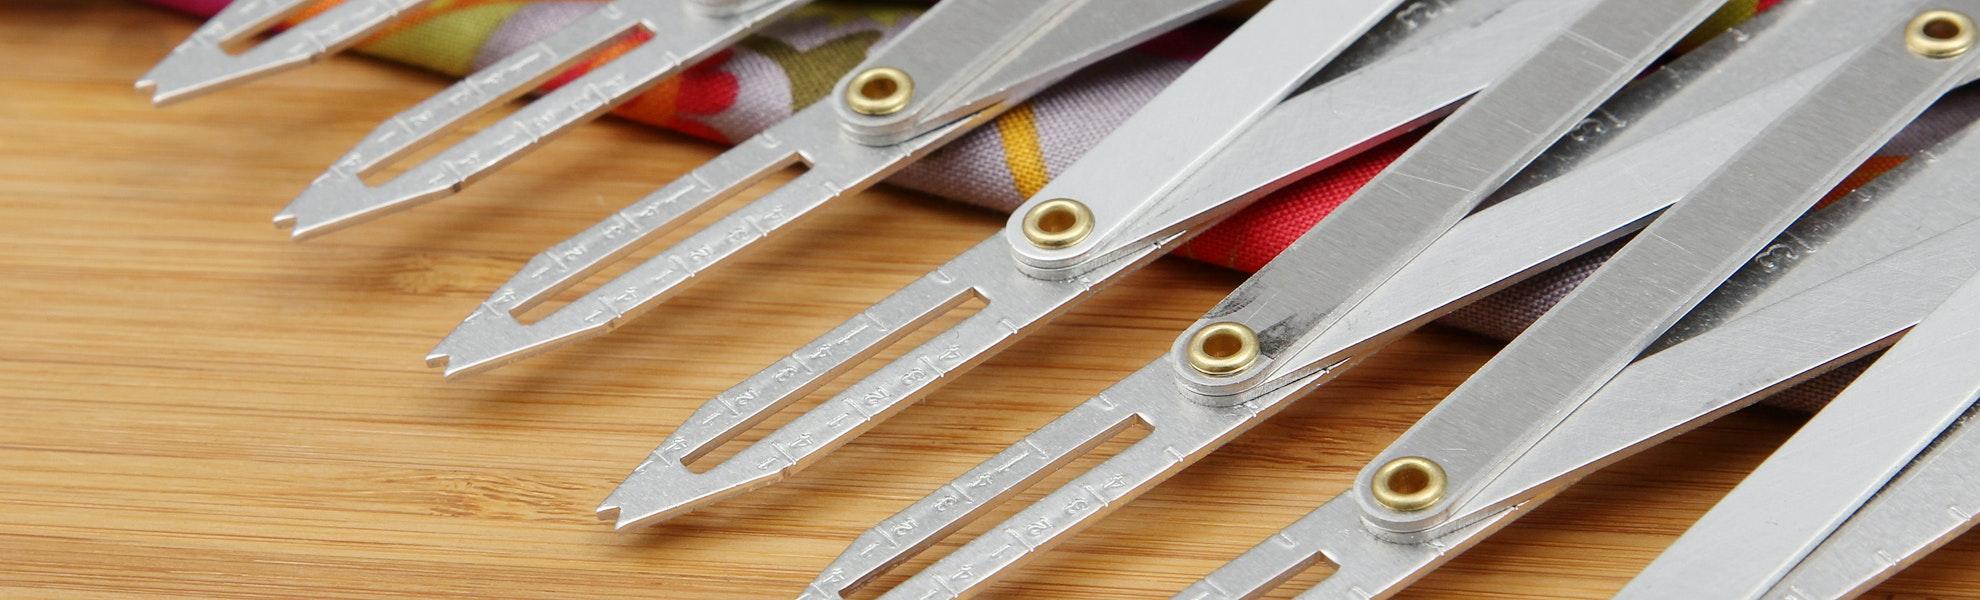 Simflex Sewing Gauge